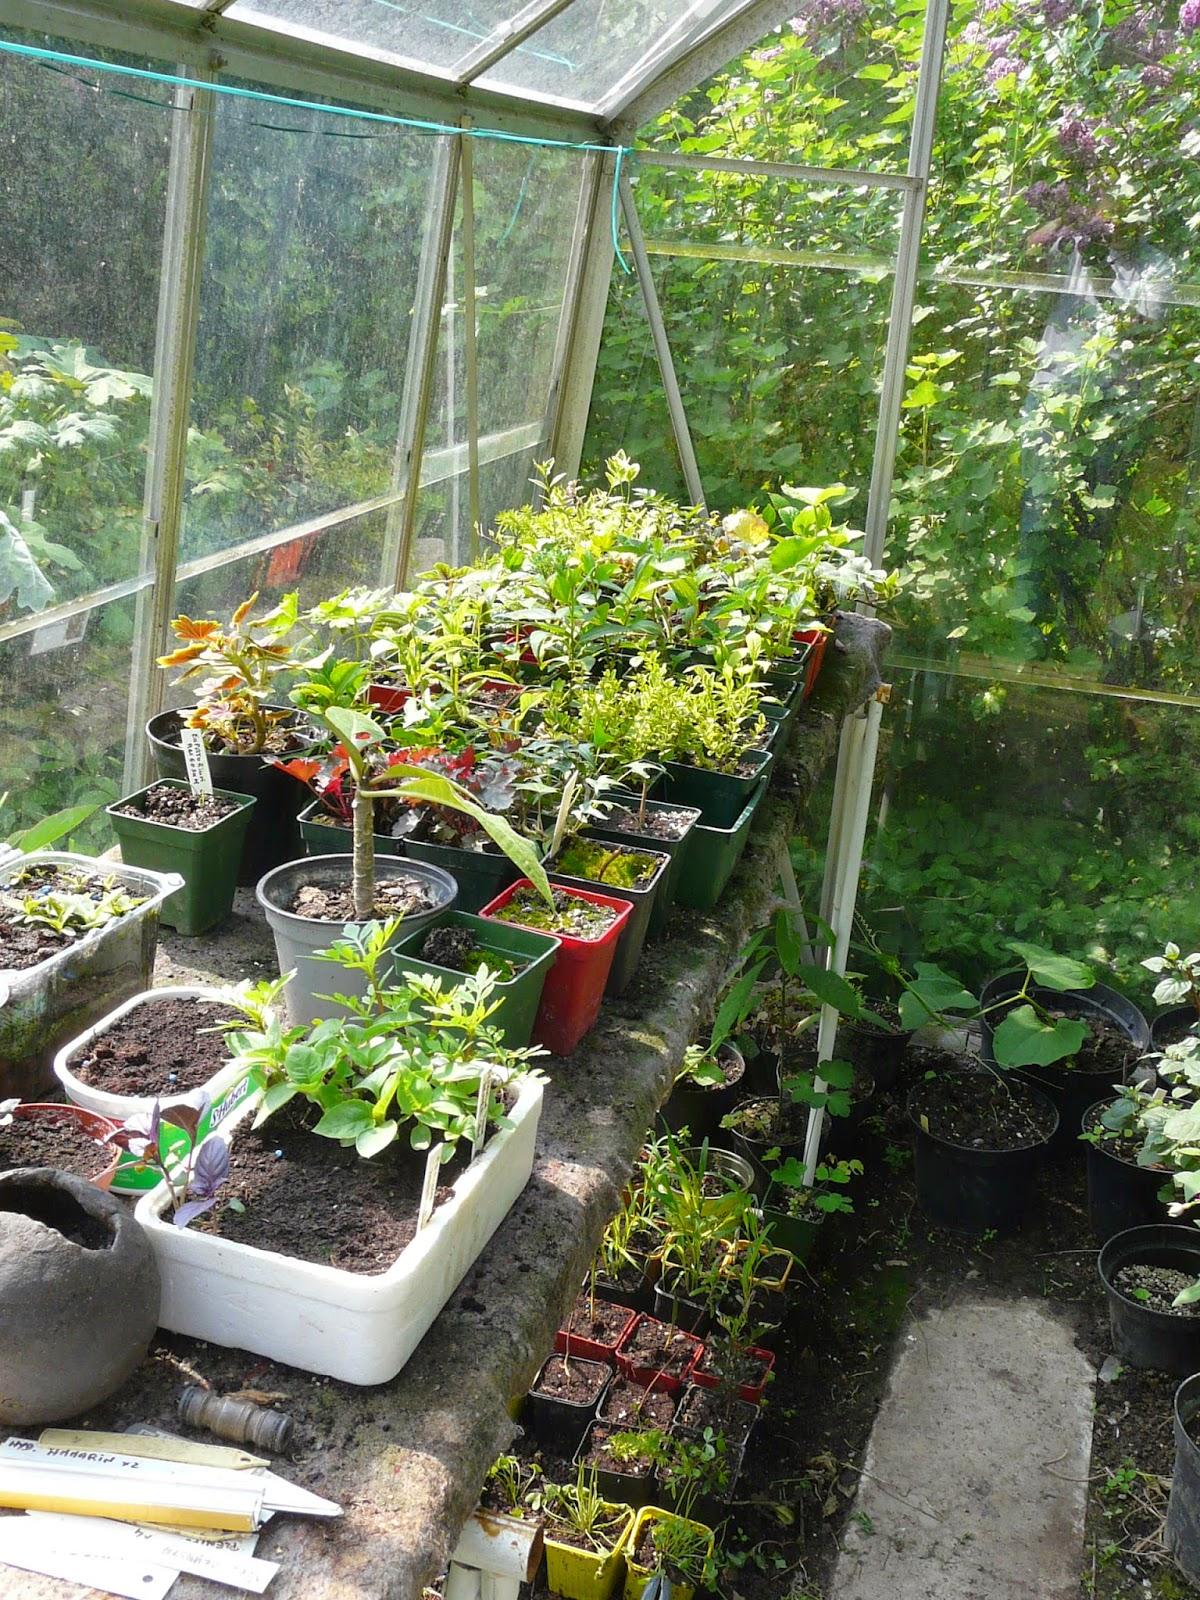 Le jardin de daphn e la multiplication au jardin de daphn e - Bouture de l hibiscus de jardin ...